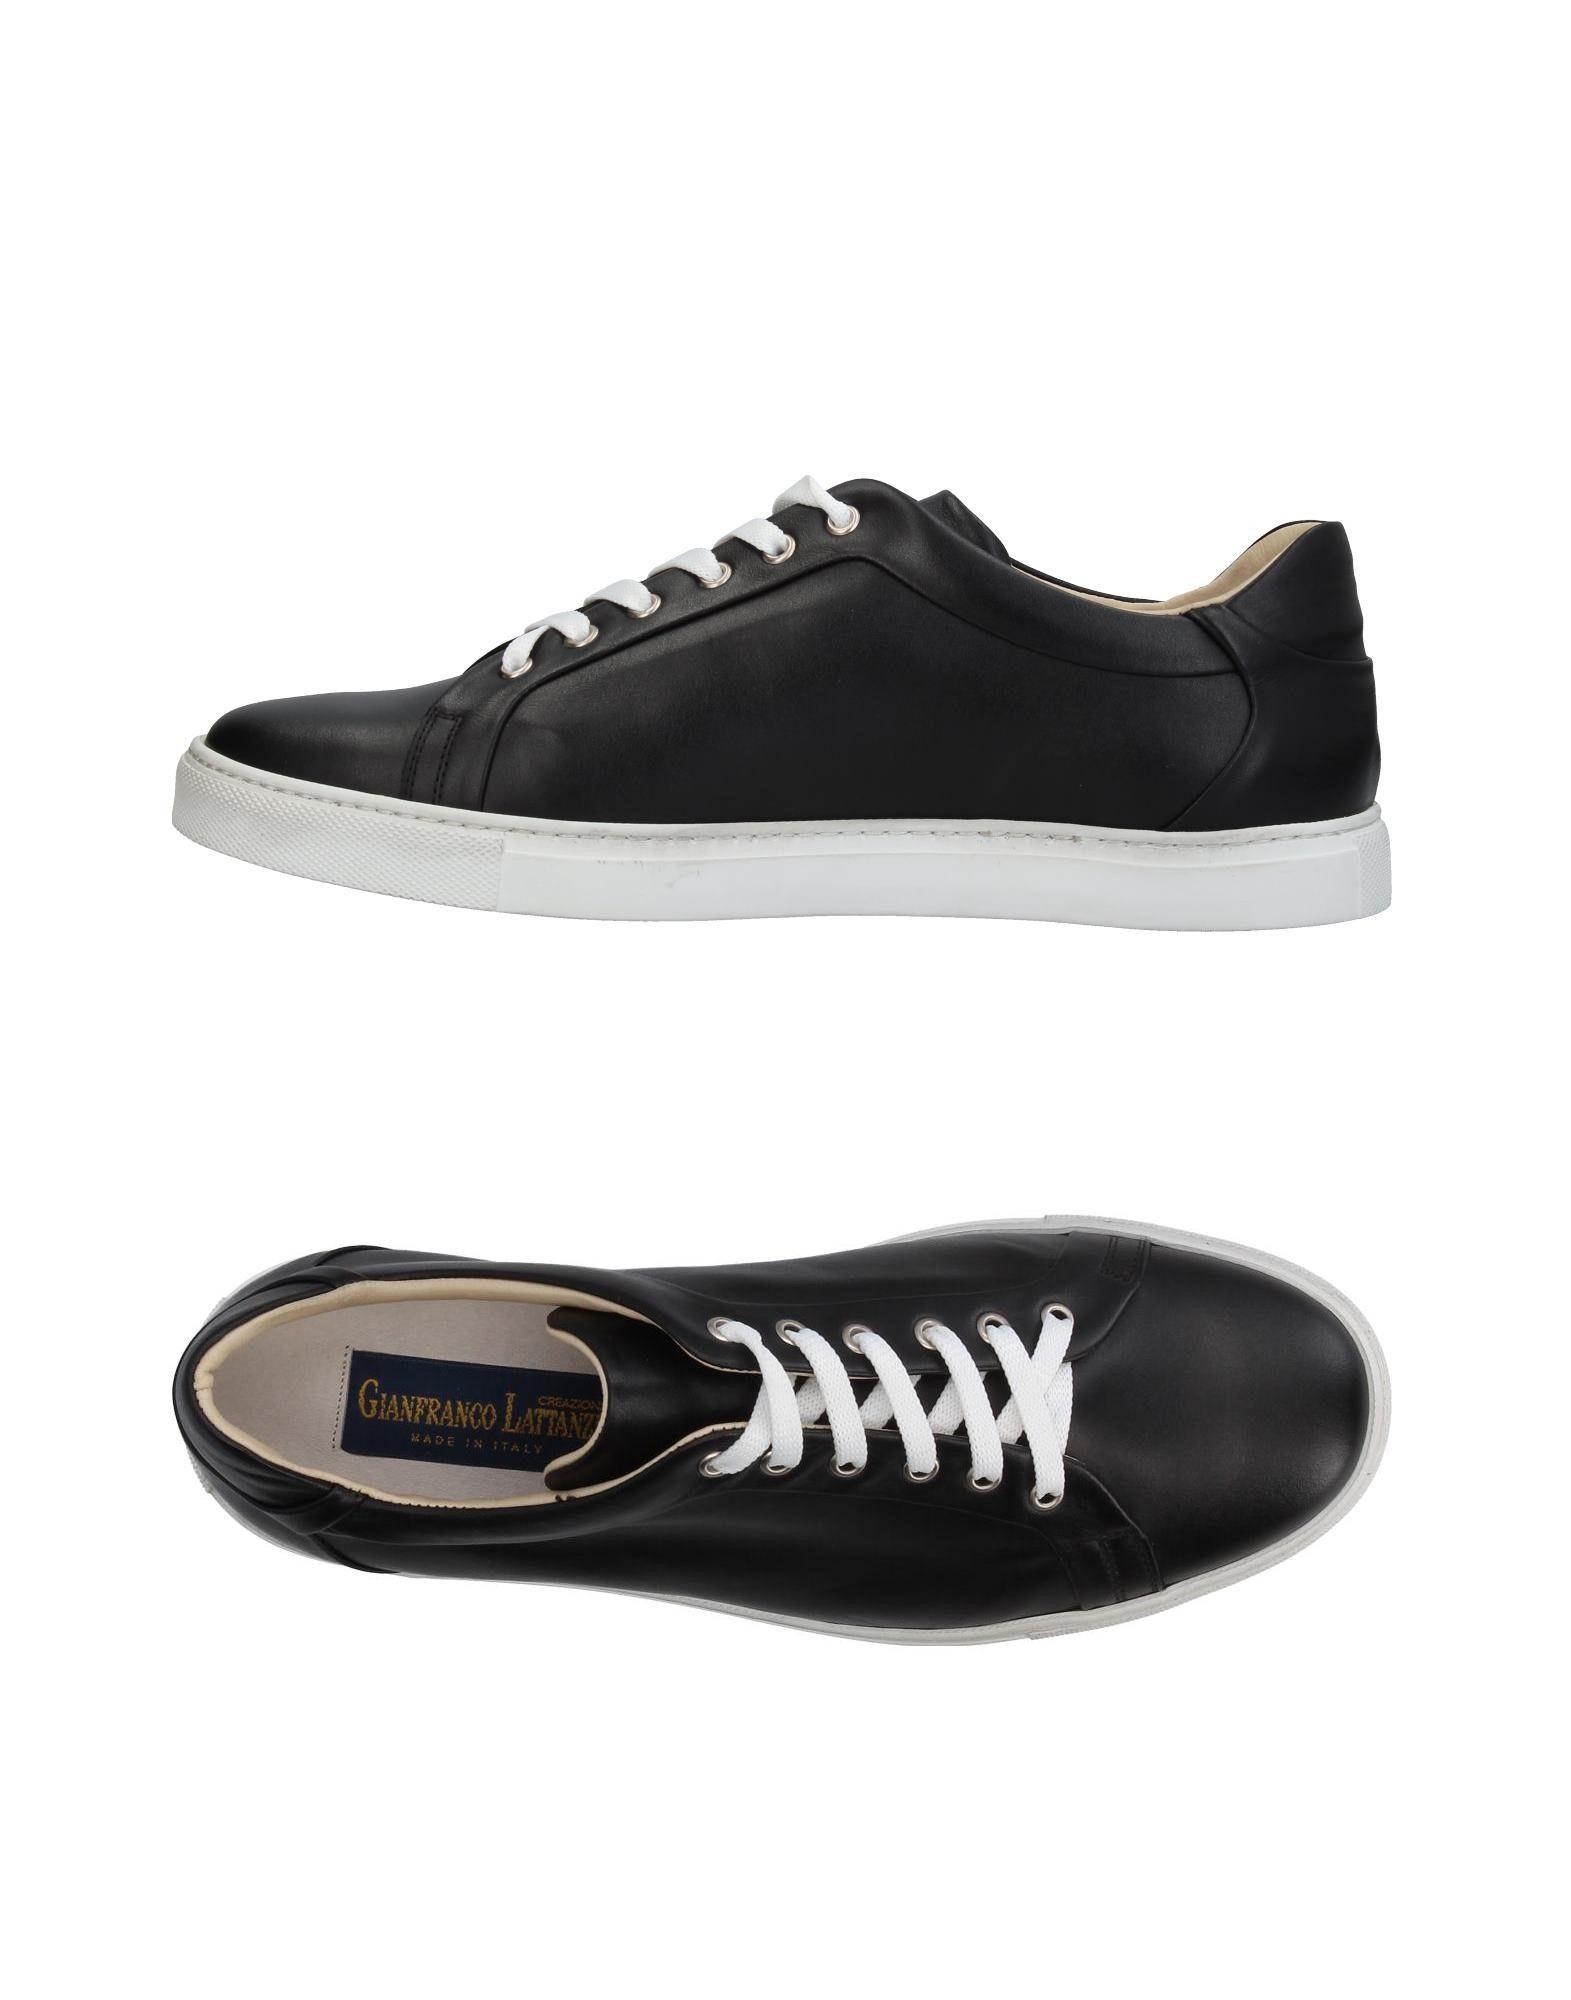 Gianfranco Lattanzi Sneakers Herren  11385386VQ Neue Neue 11385386VQ Schuhe 75f537